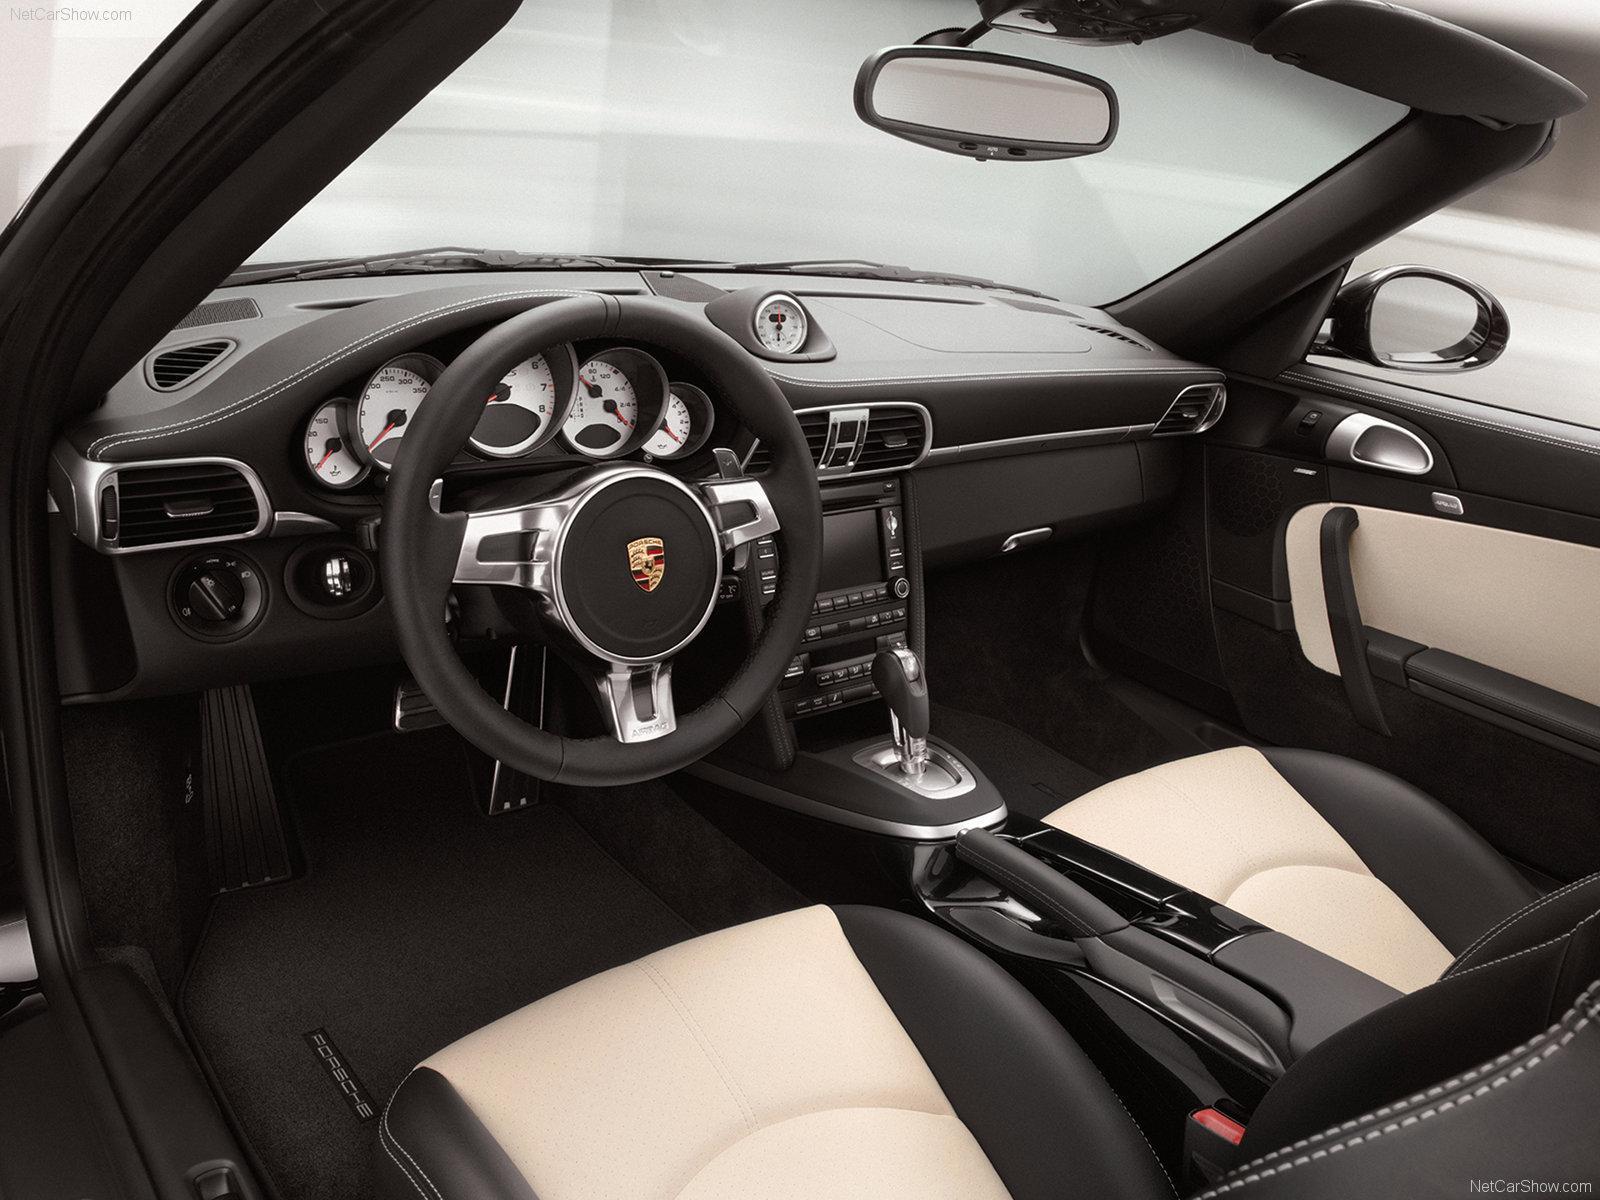 Porsche-911_Turbo_S_2011_1600x1200_wallpaper_05